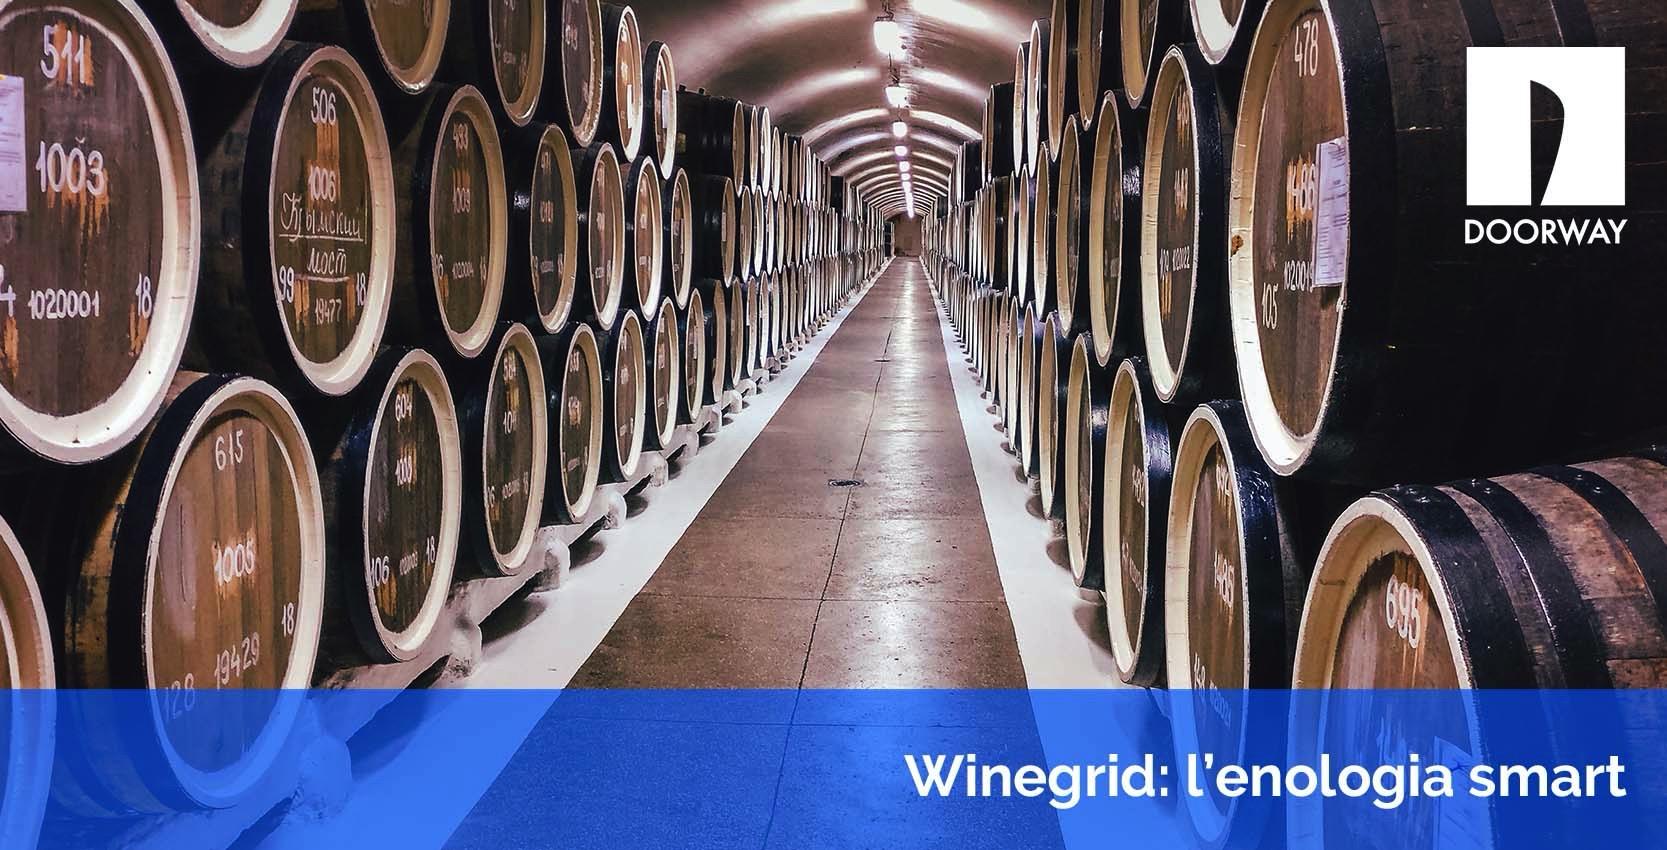 Winegrid: l'enologia smart